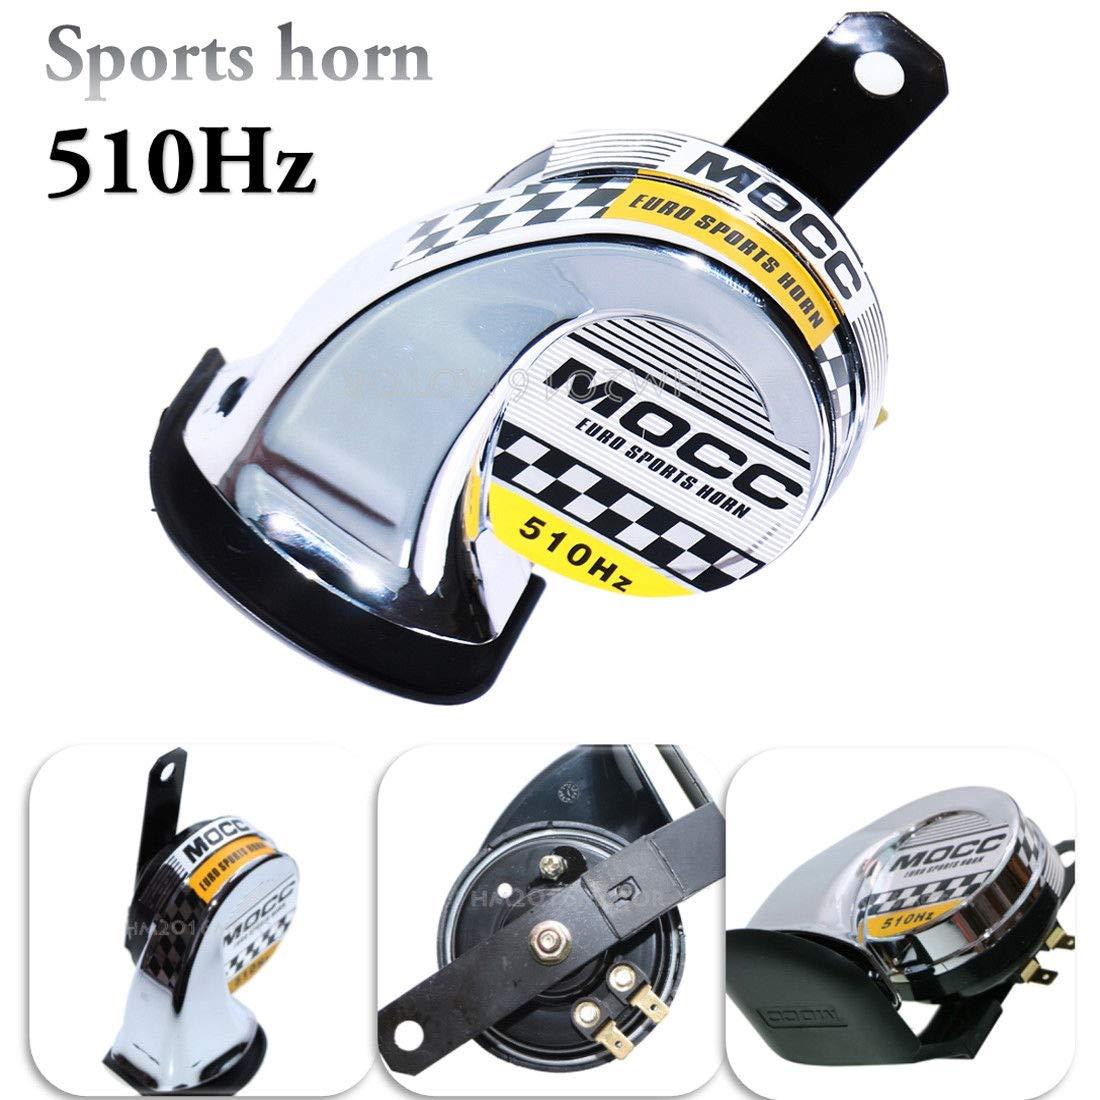 DC 12V 510Hz Sports Horn For Honda Shadow Sabre VT VF 700 750 1100